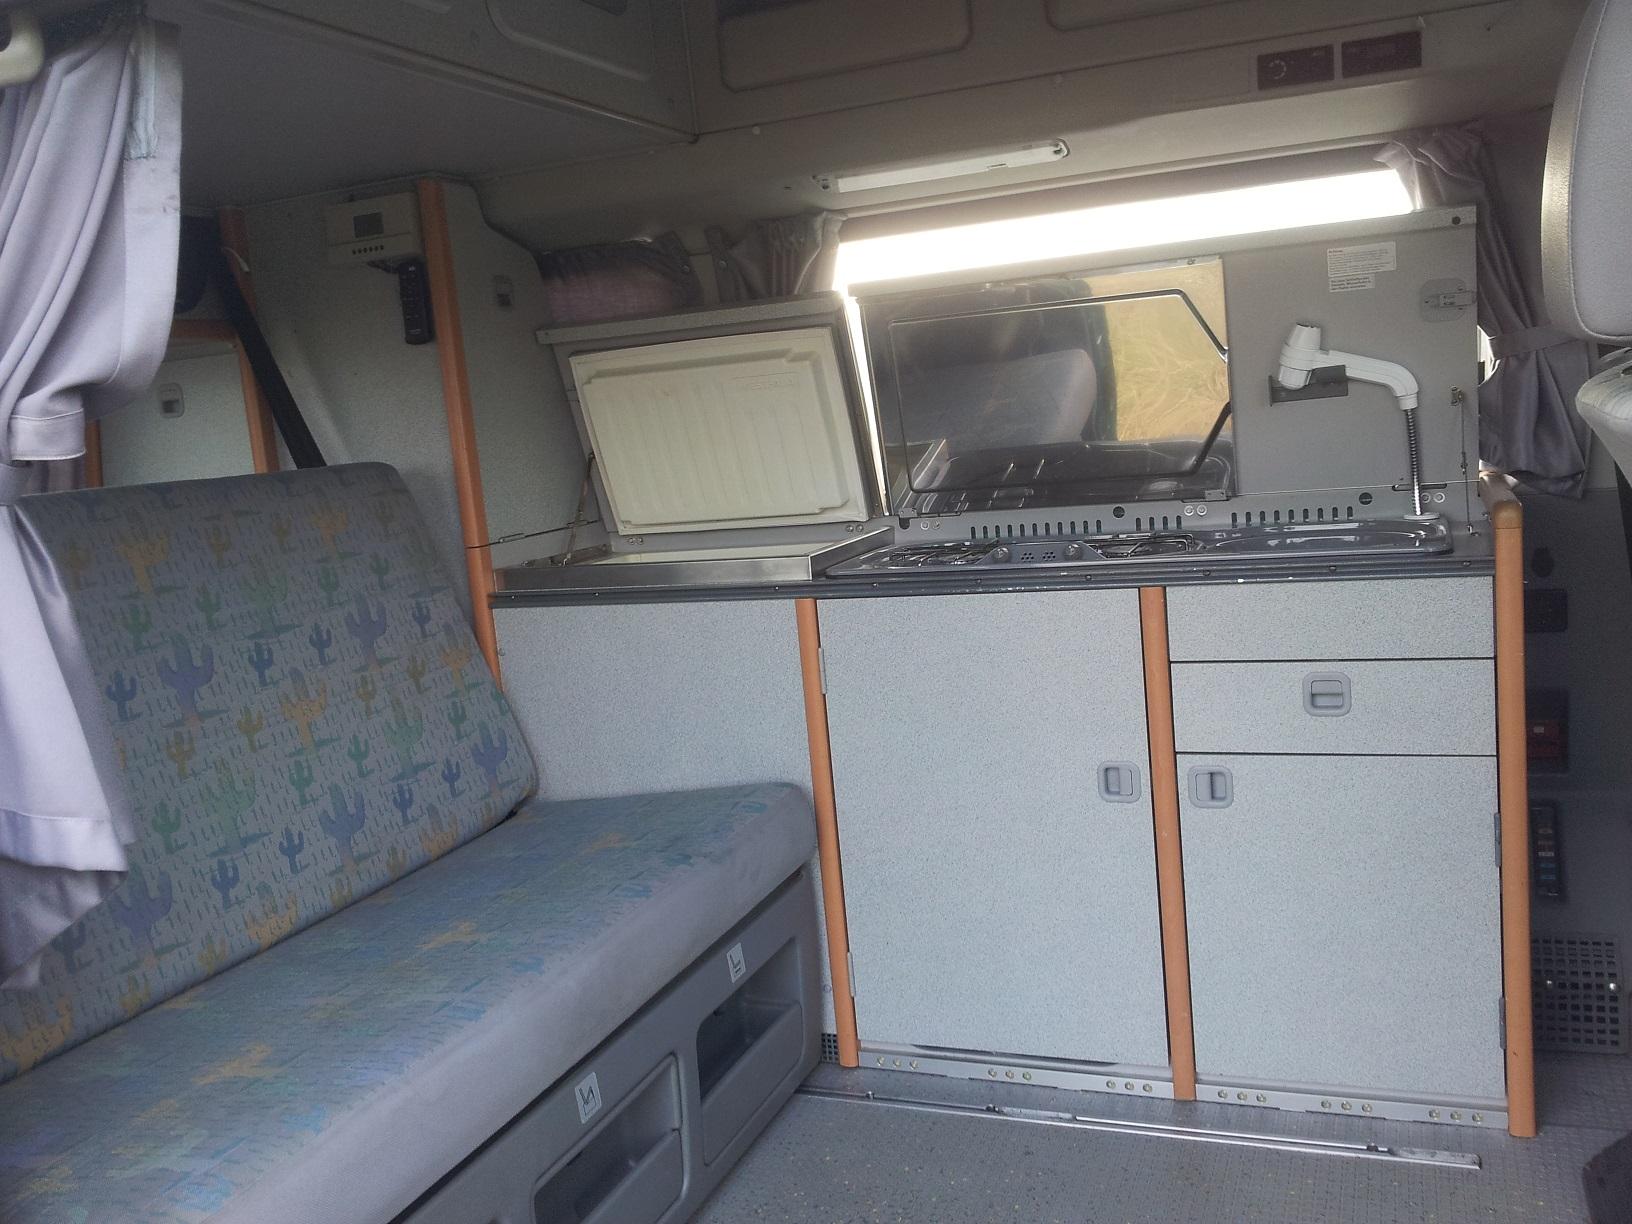 campingbus mieten und ab in den urlaub. Black Bedroom Furniture Sets. Home Design Ideas